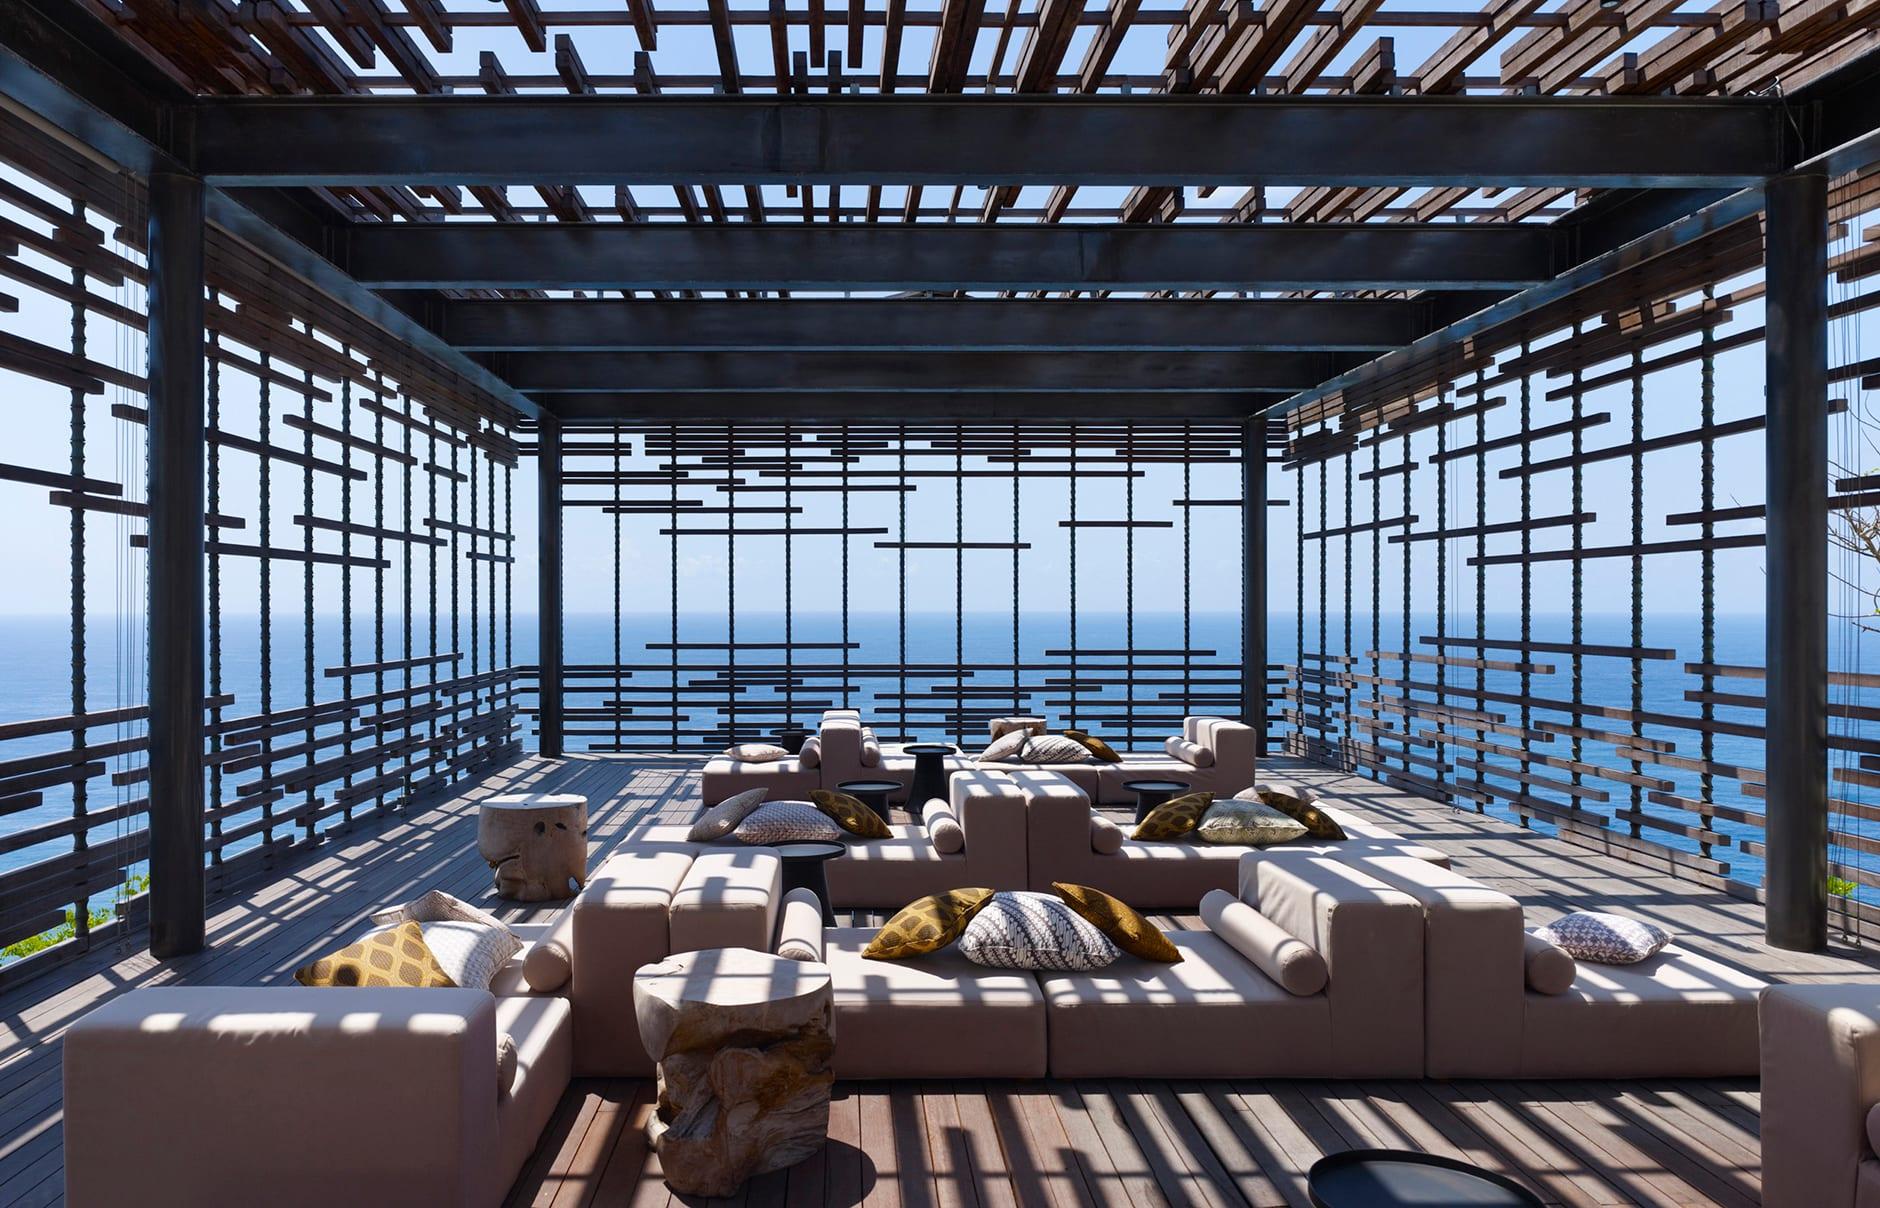 Alila Villas Uluwatu, Bali, Indonesia. Luxury Hotel Review by TravelPlusStyle. Photo © Alila Hotels & Resorts